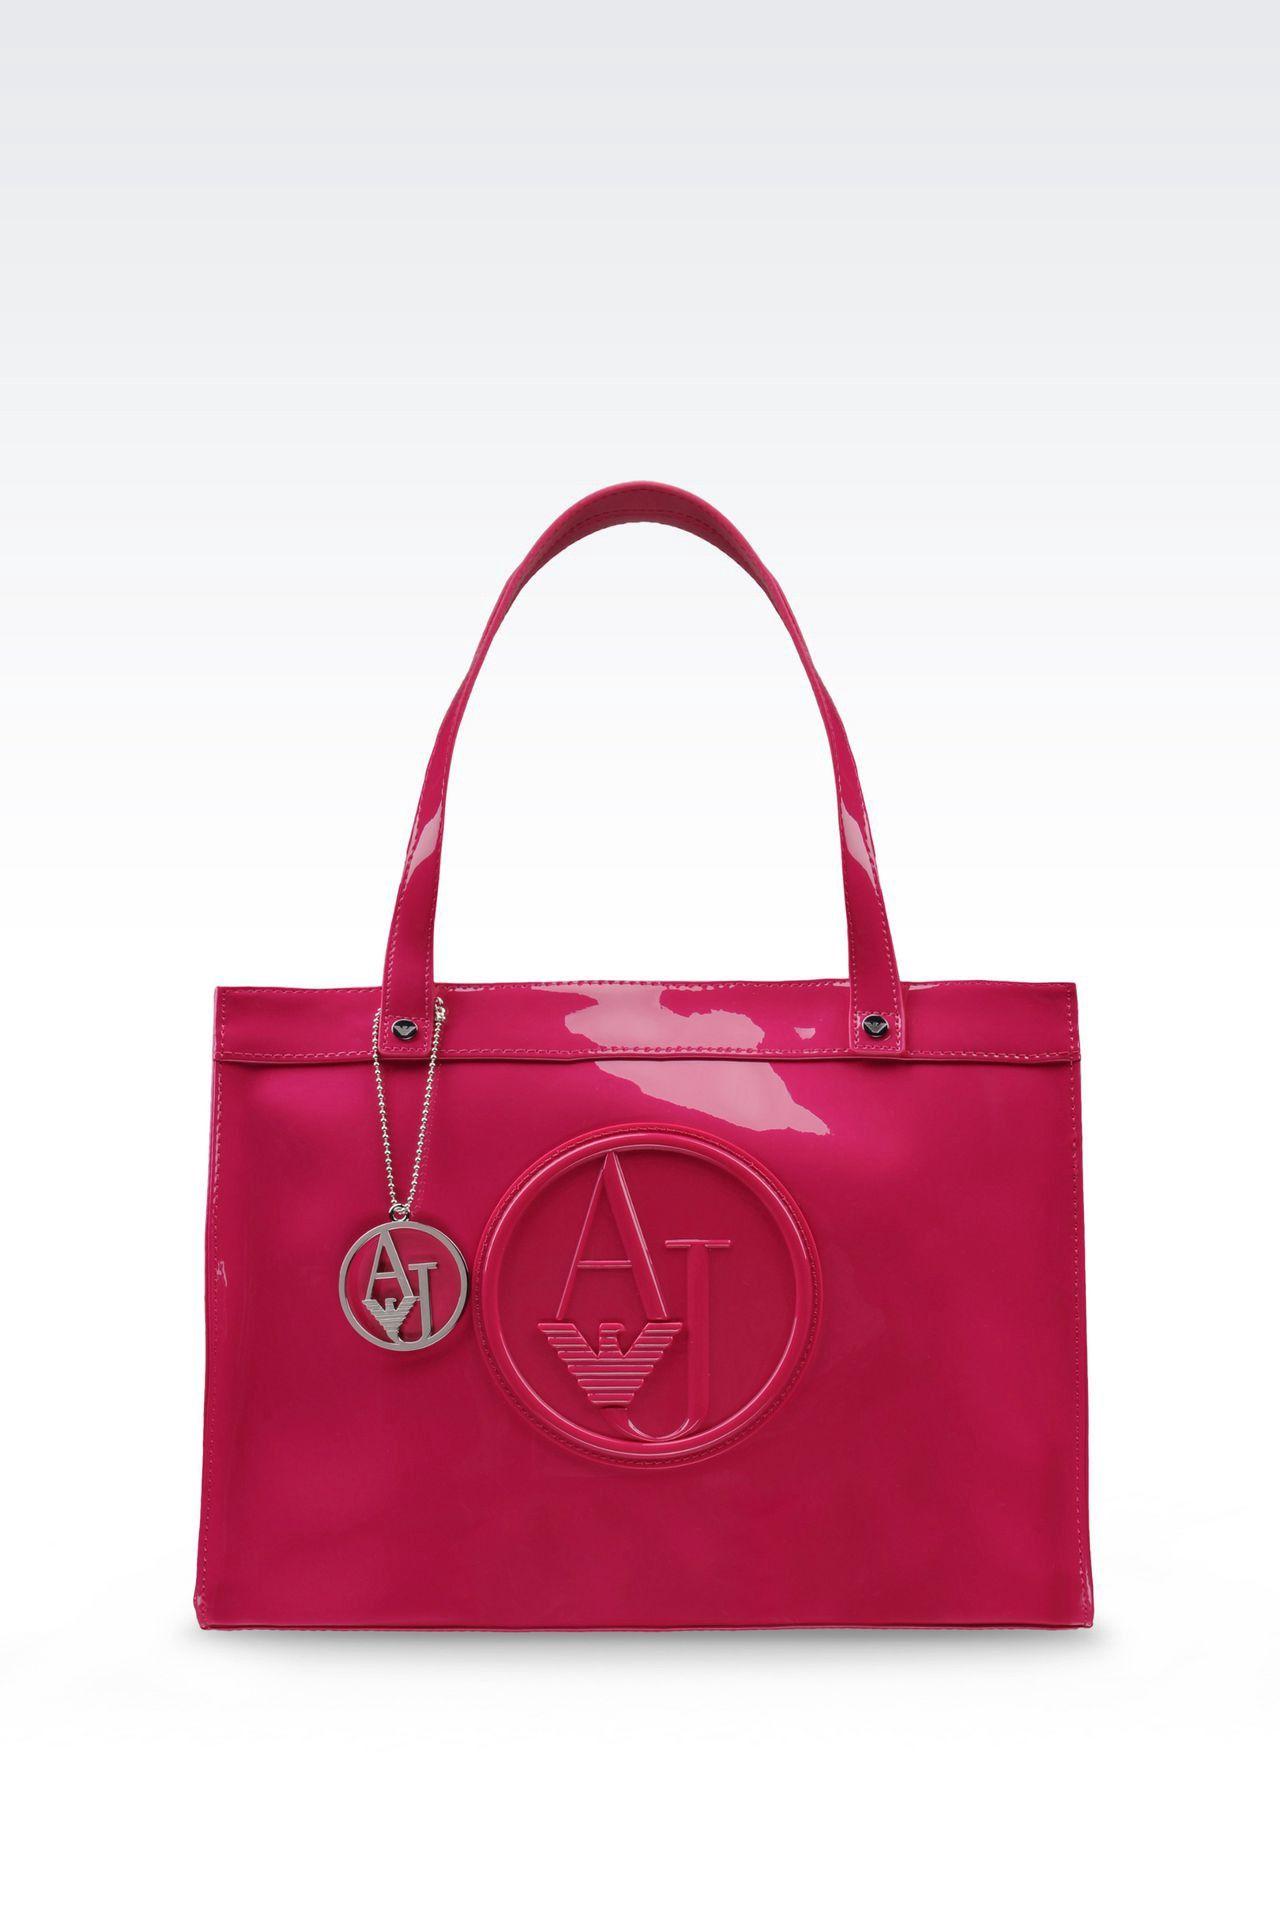 ARMANI COLLEZIONI SHOPPING BAG IN PATENT FAUX LEATHER WITH PENDANT.   armanicollezioni  bags  patent  hand bags  pvc   7f2025f09fdce